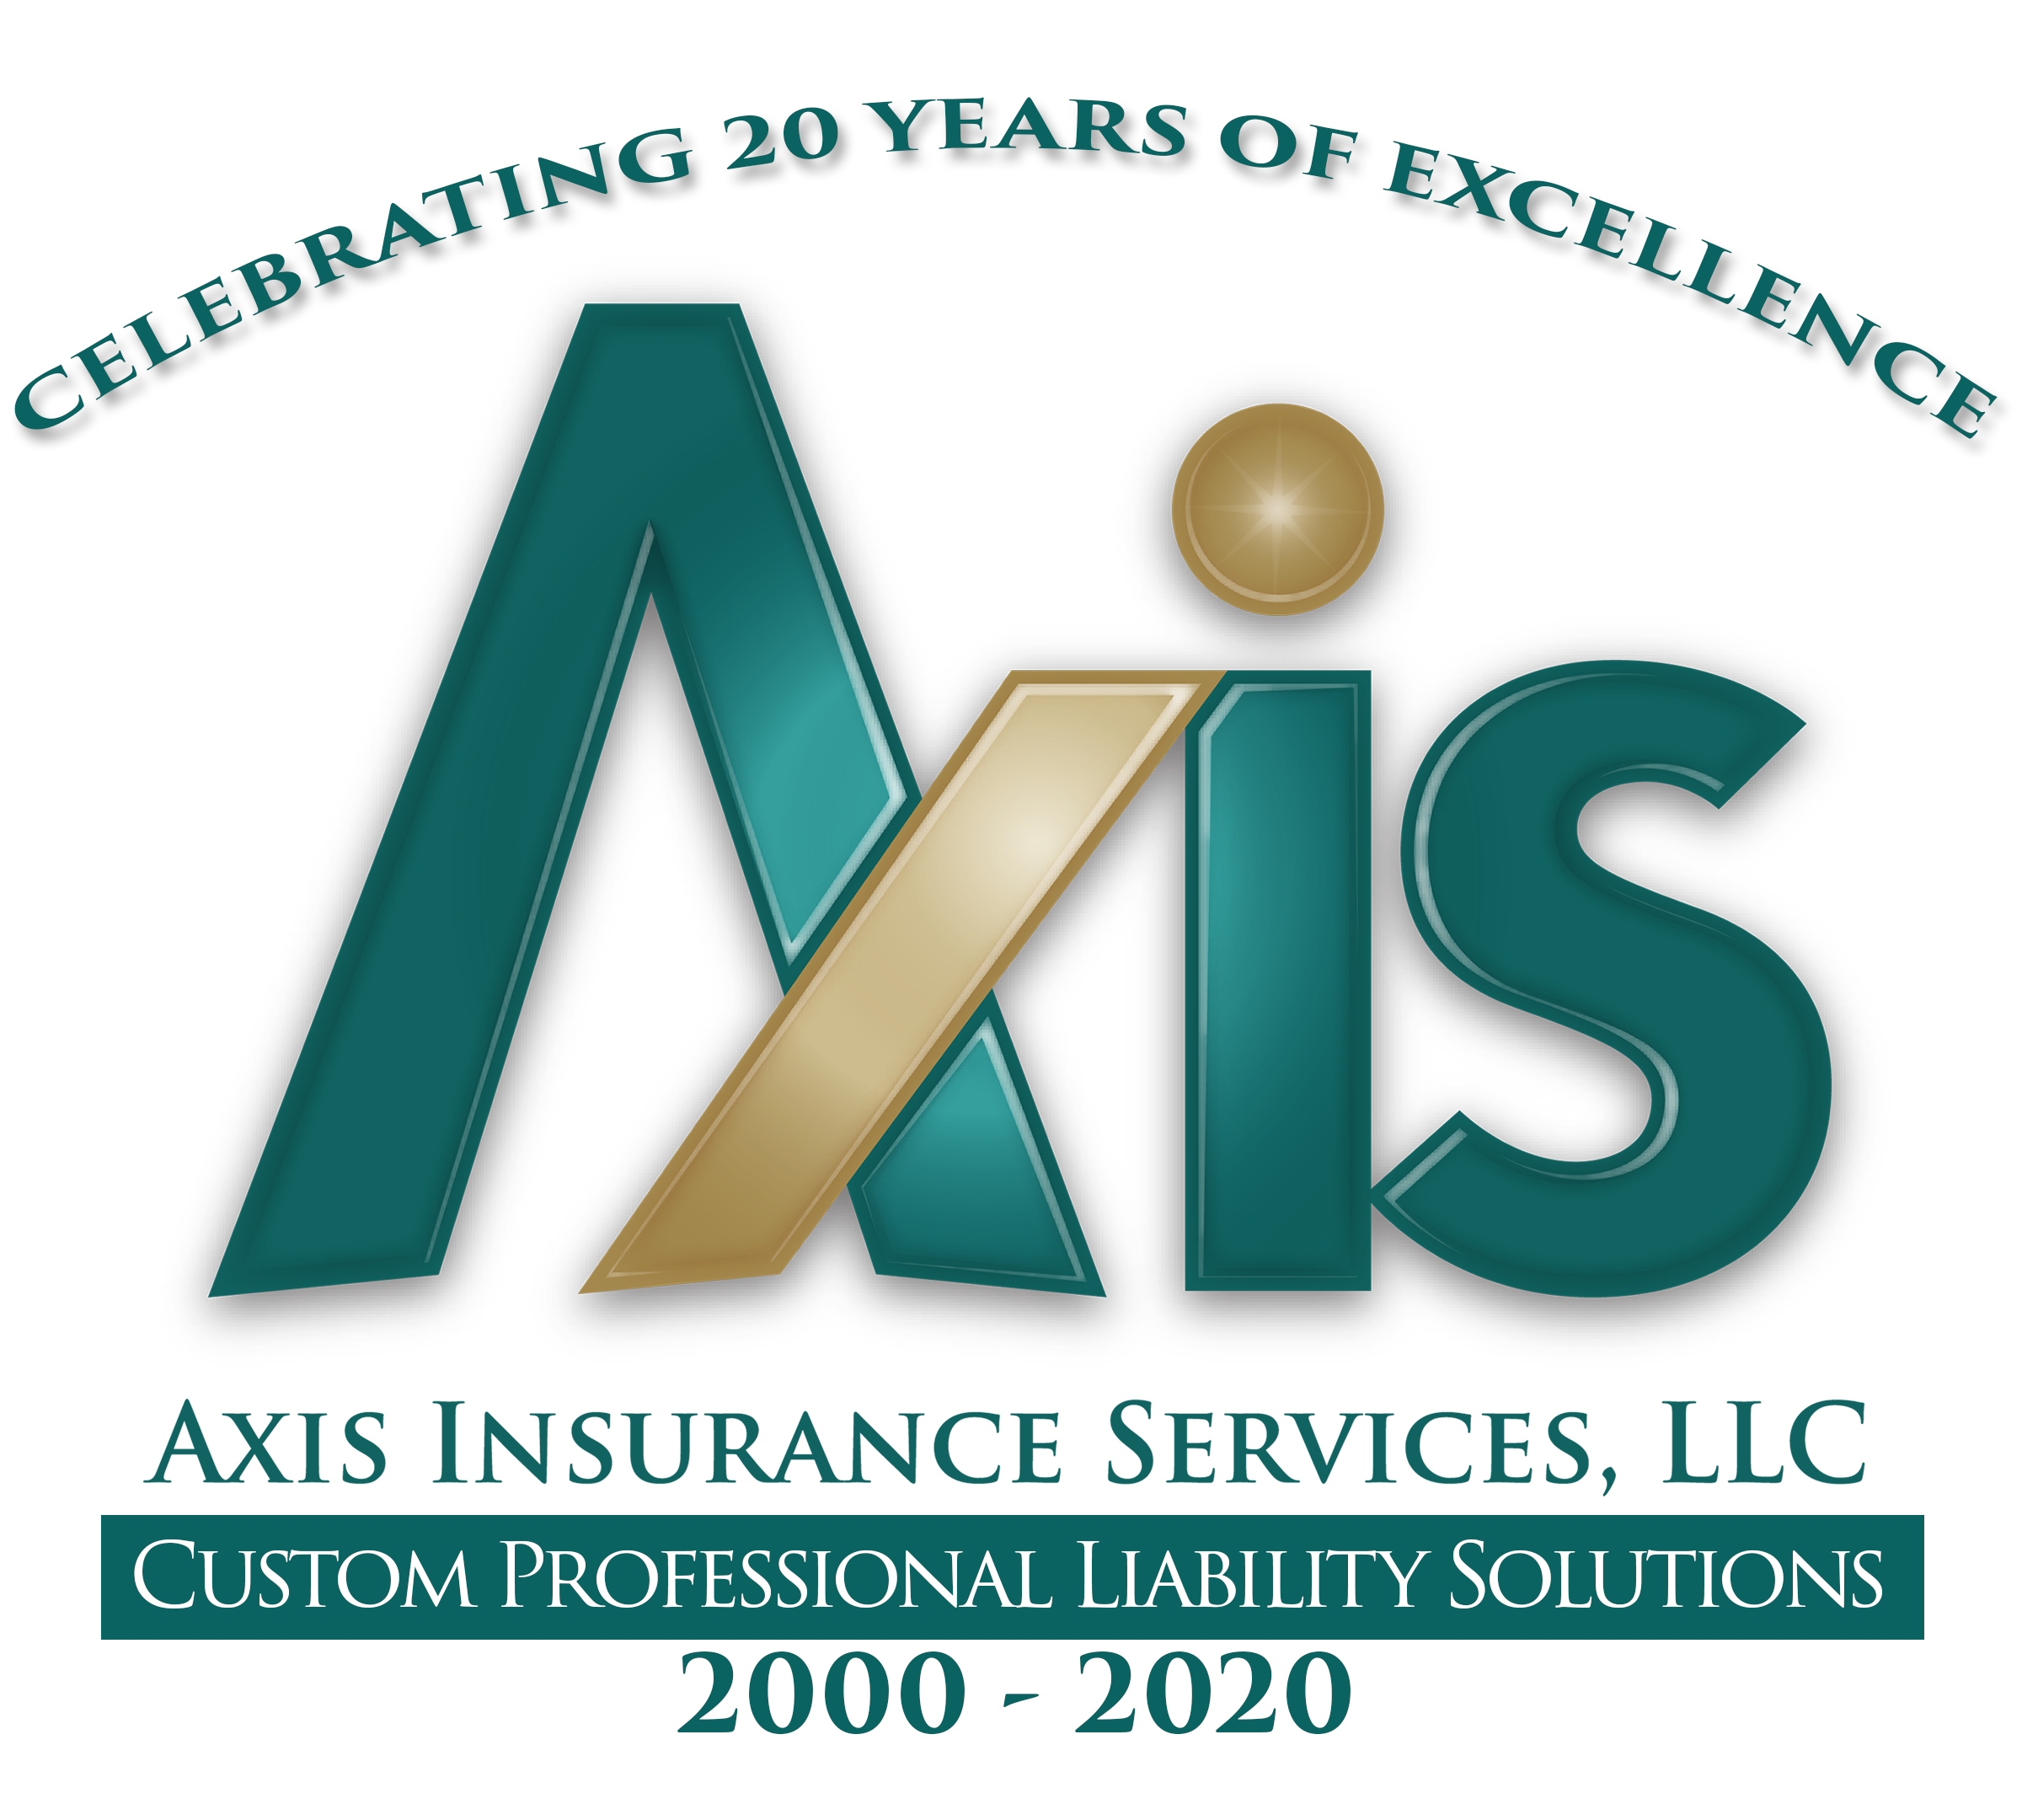 25th_AXIS INSURANCE_V5 (1)-1